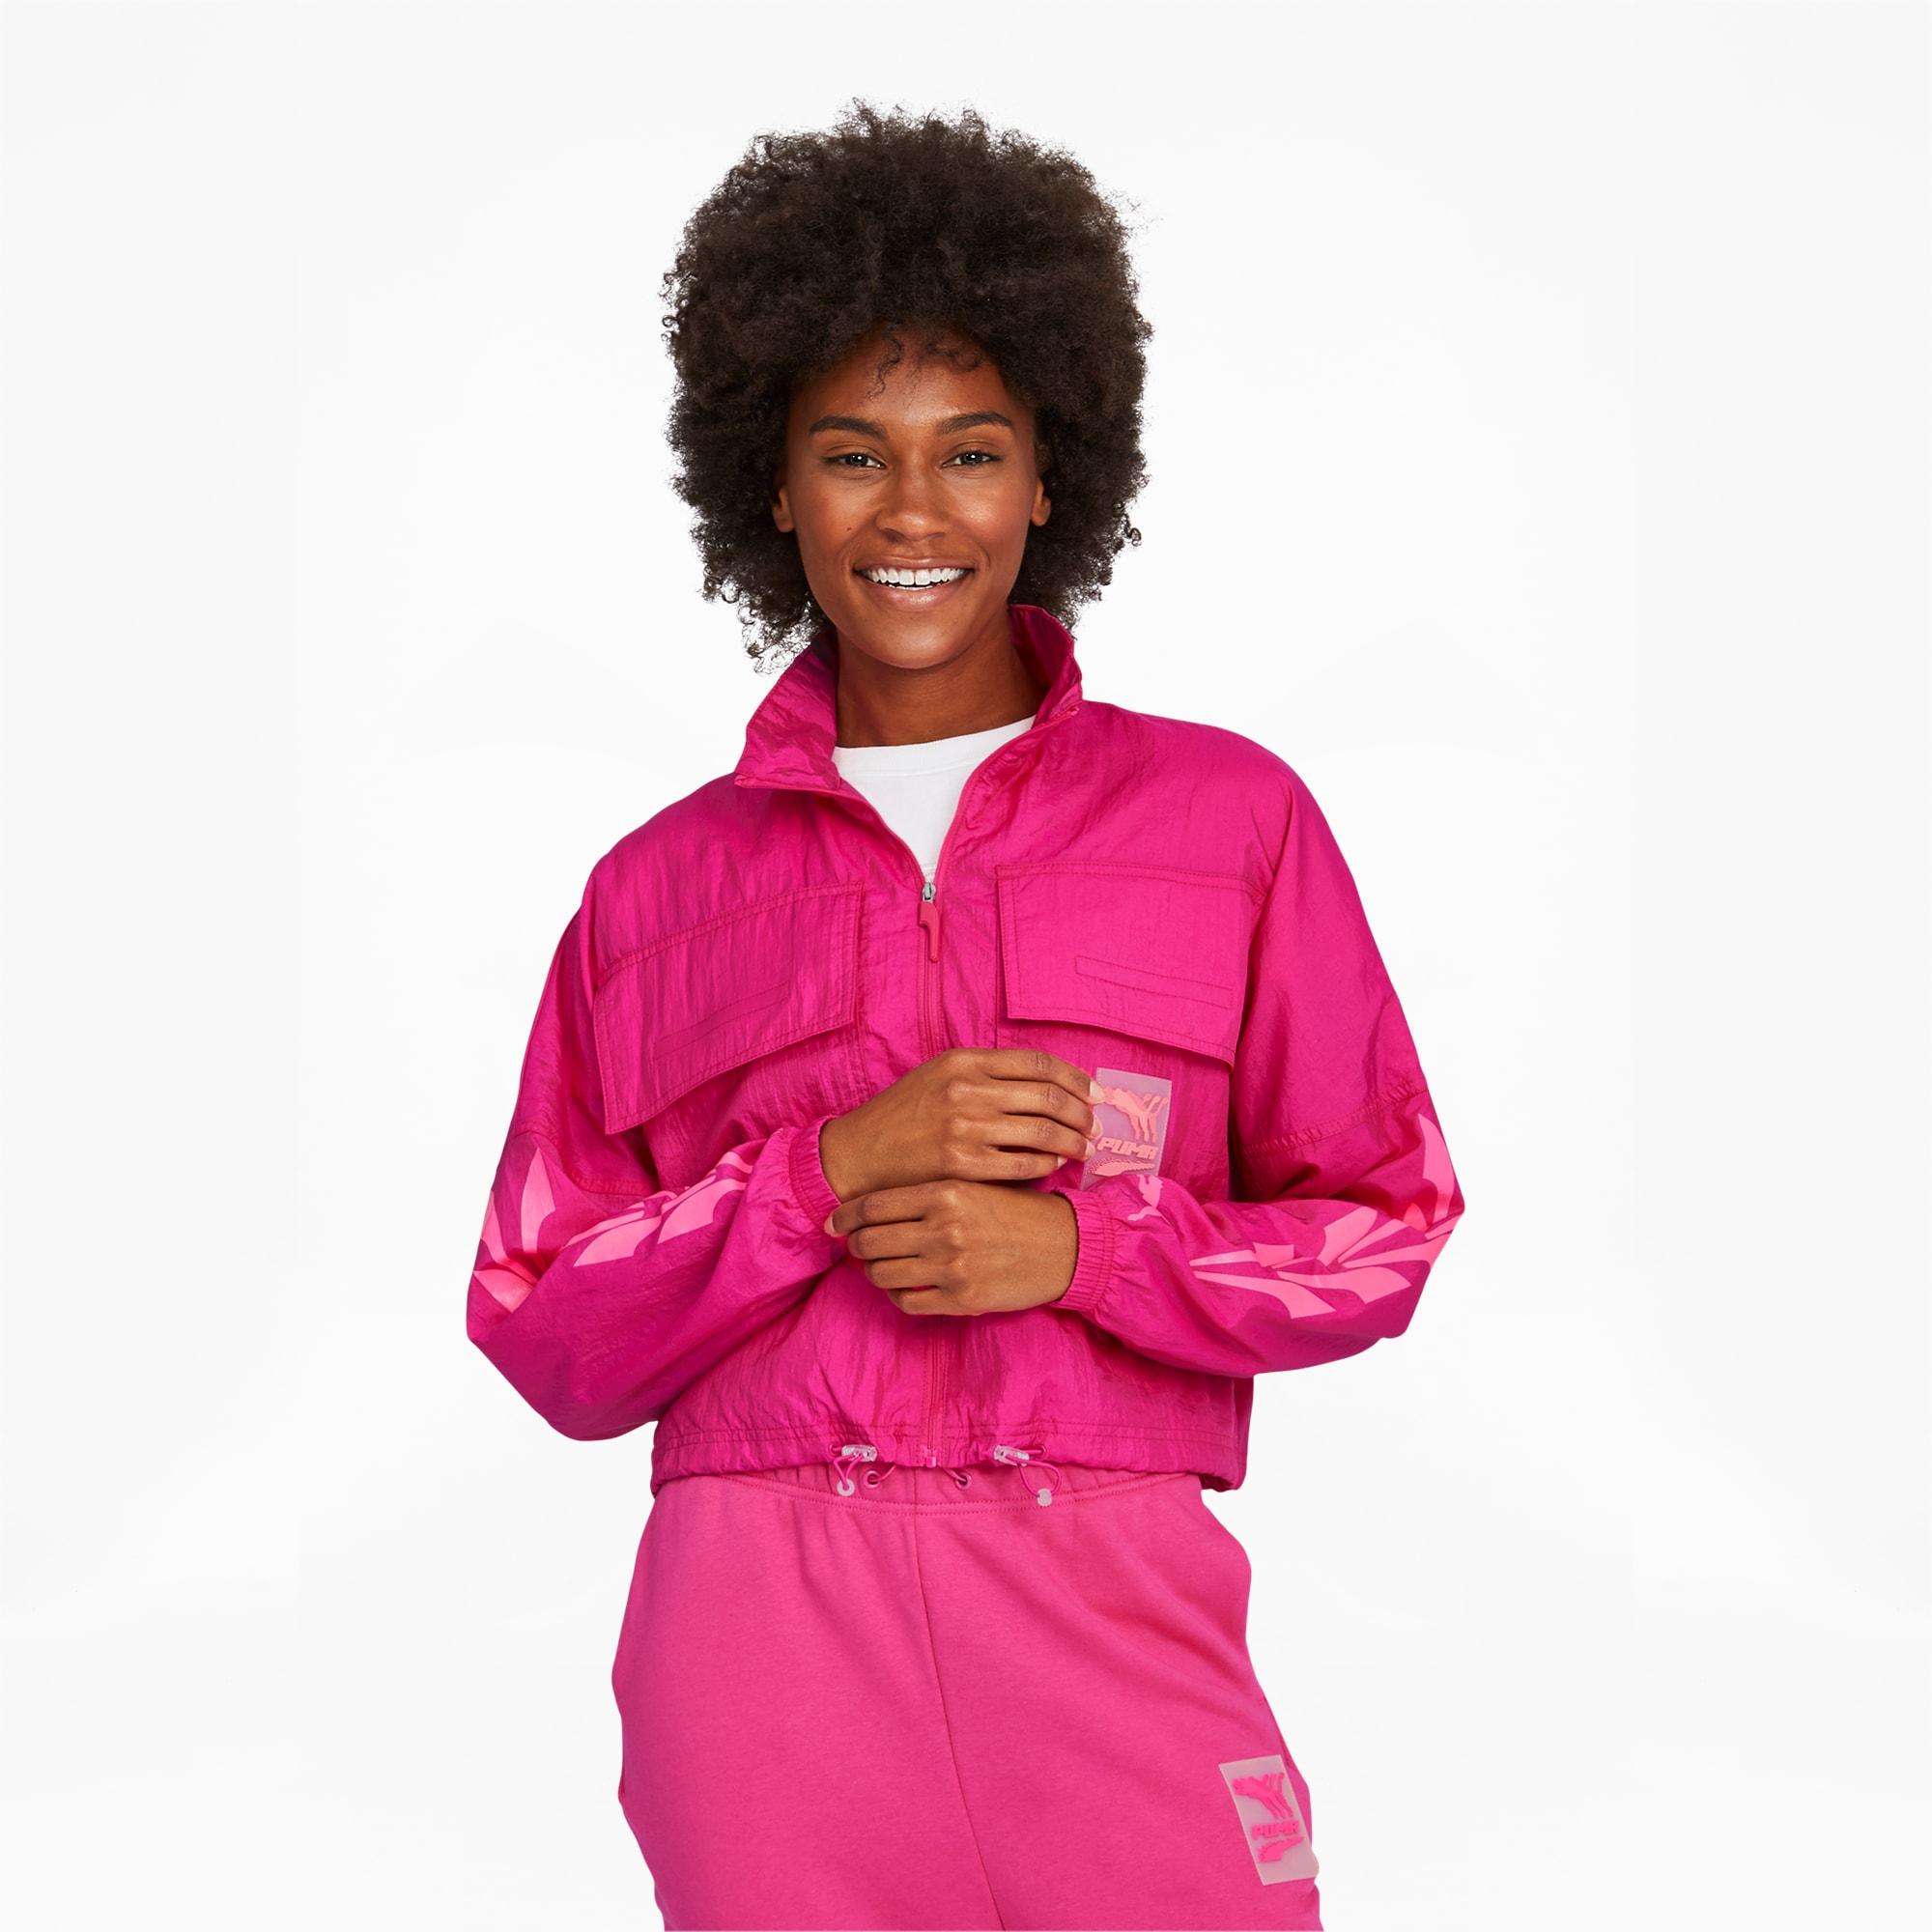 puma -  Evide Gewebte Damen Trainingsjacke | Mit Aucun | Lila | Größe: S